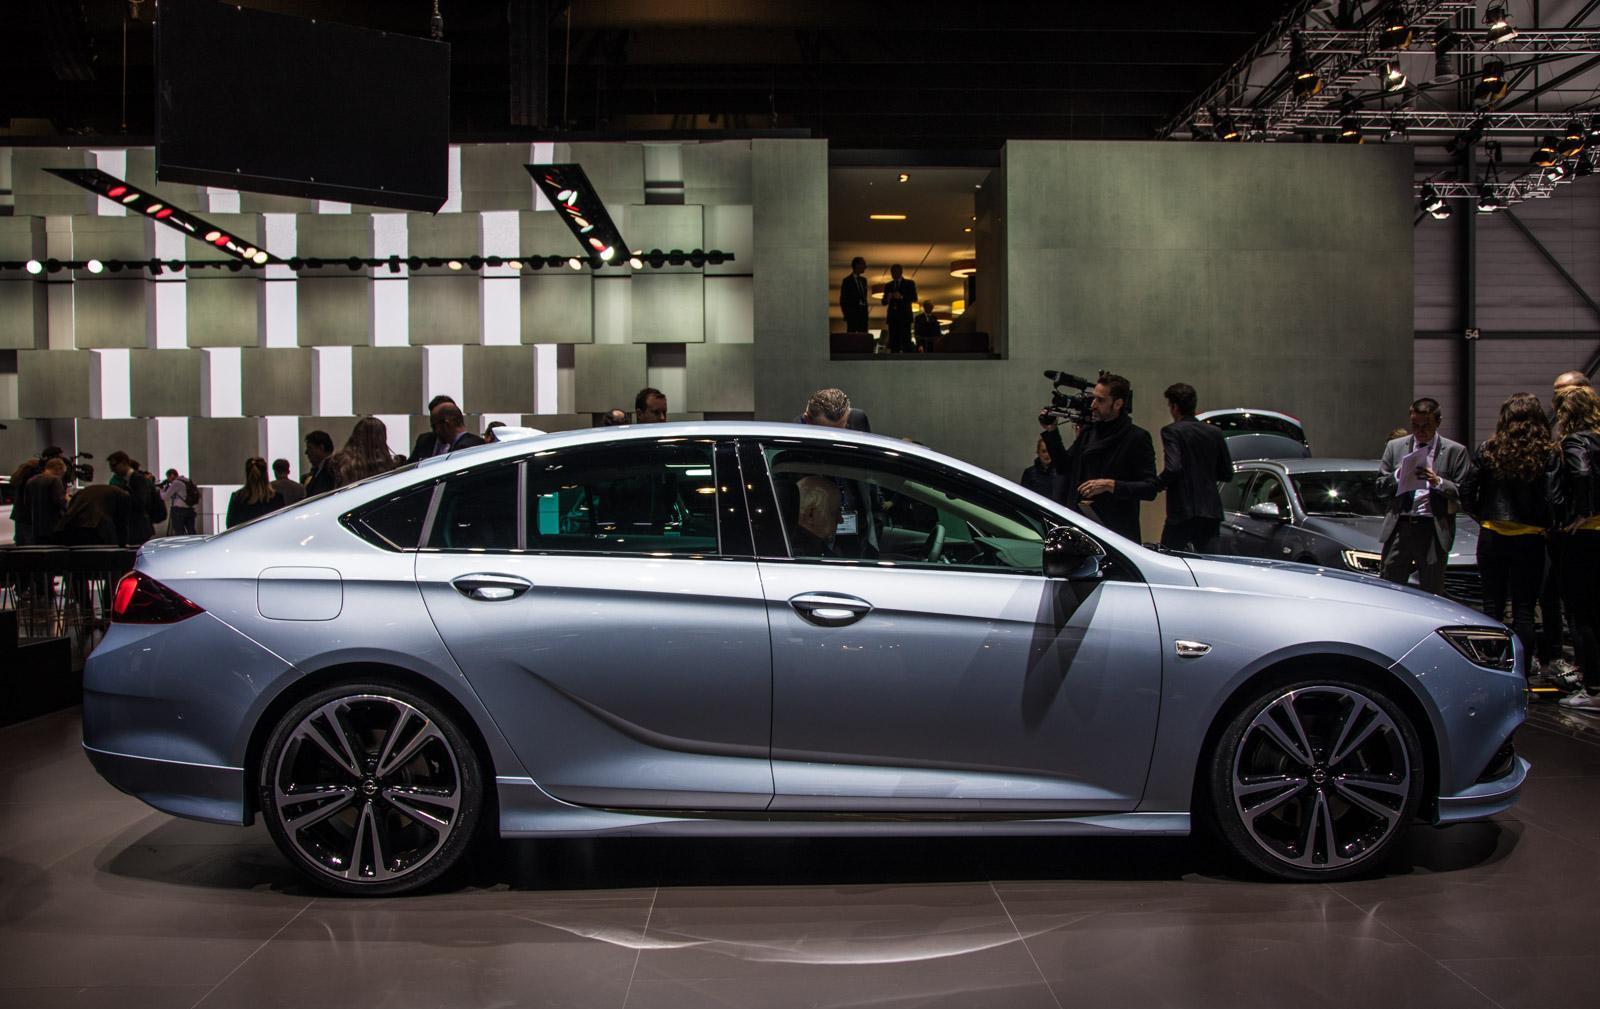 Opel-insignia-012